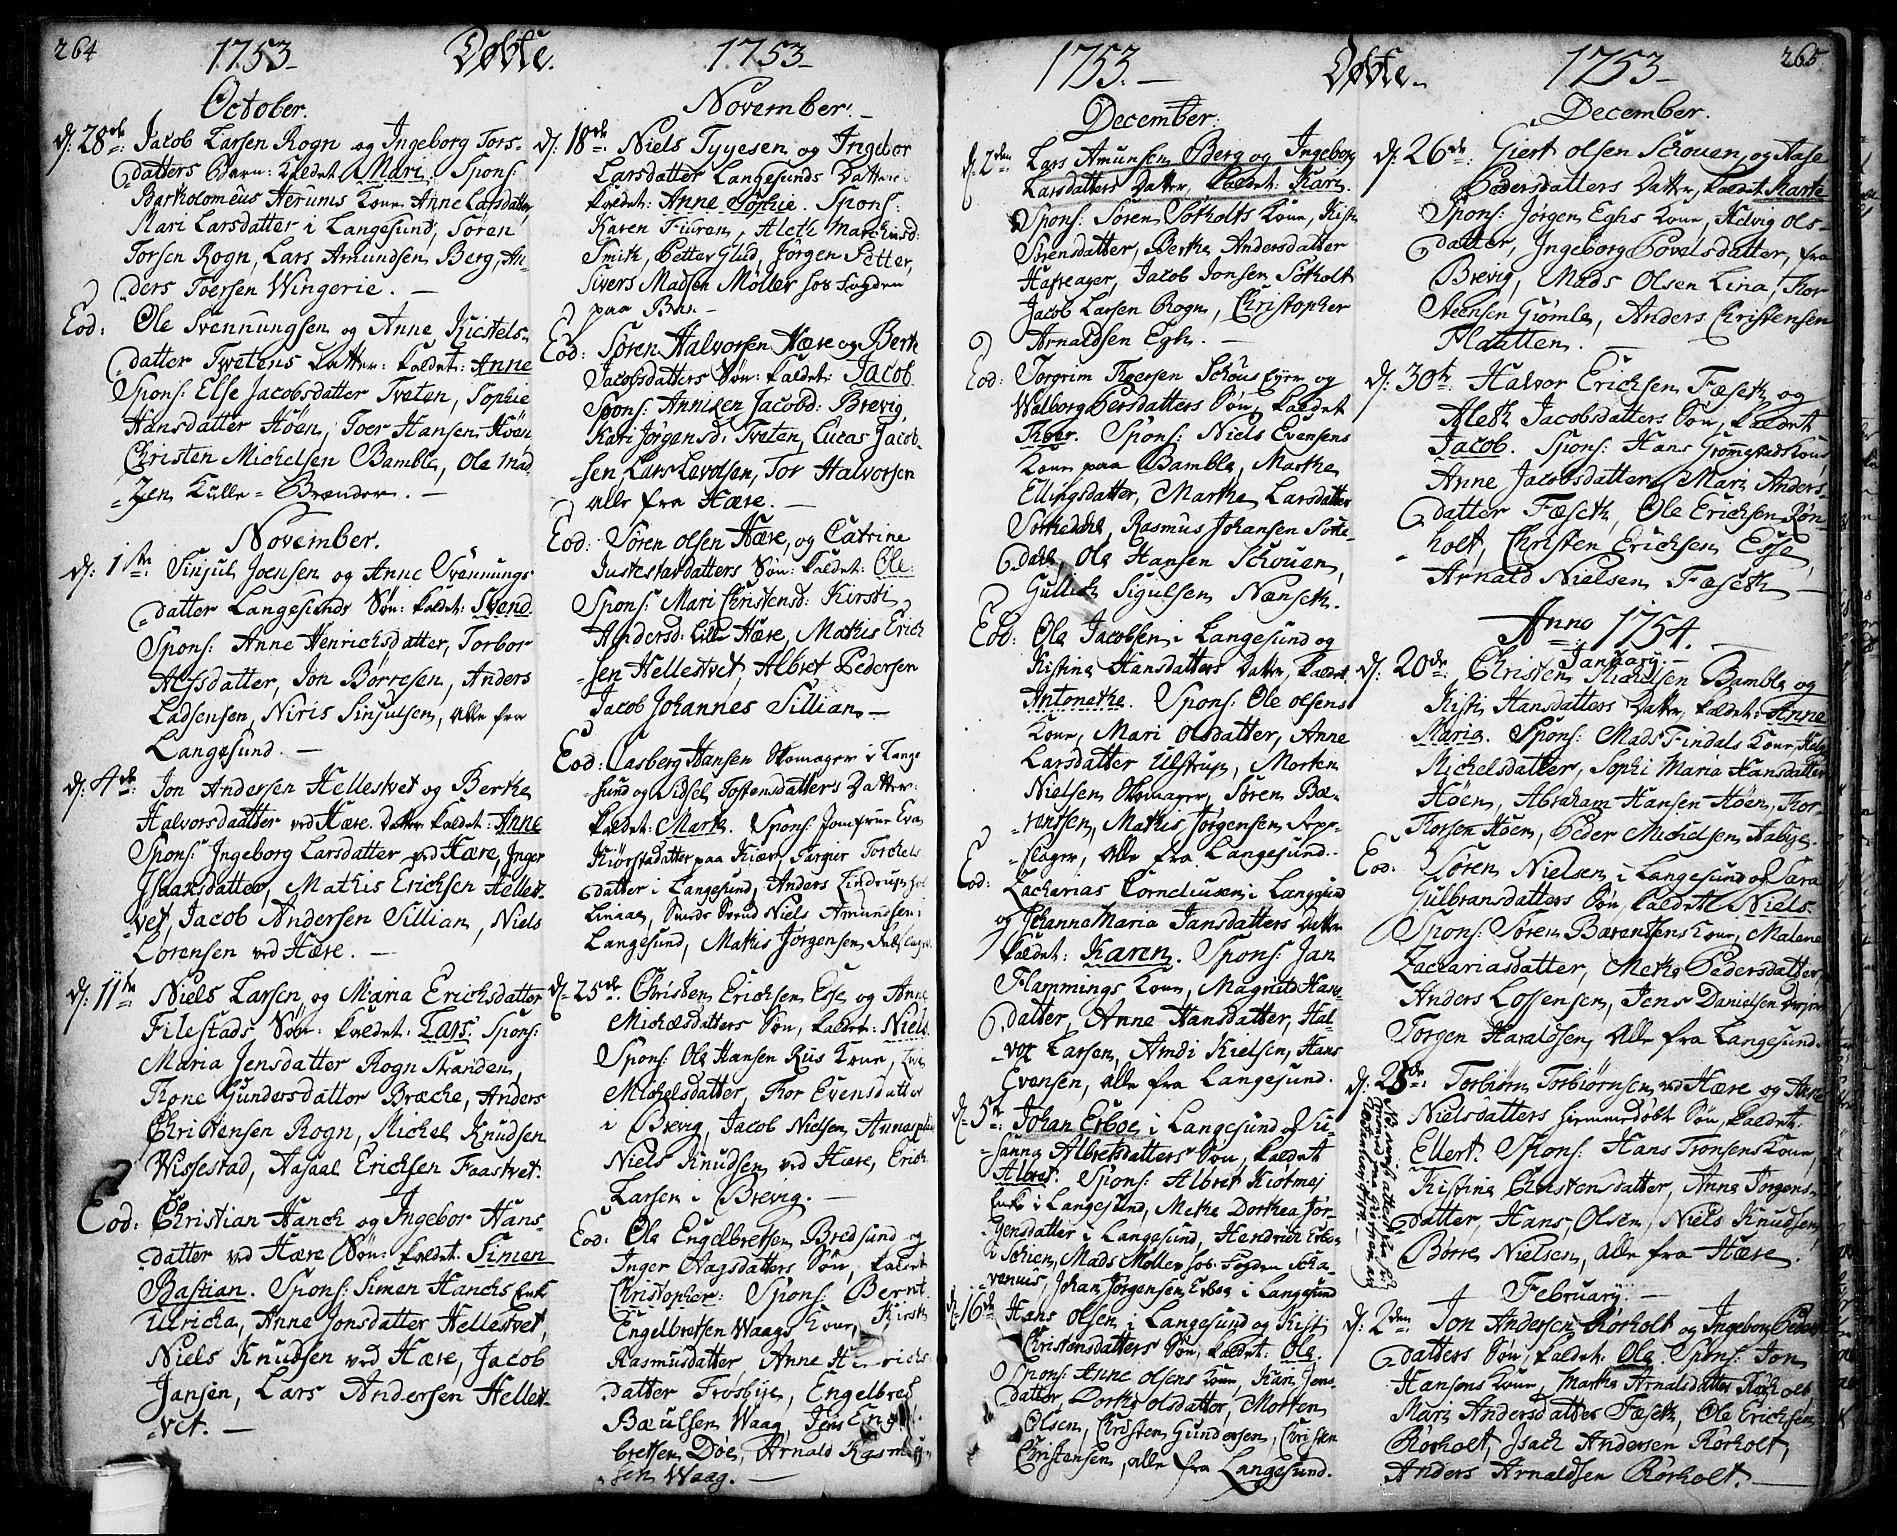 SAKO, Bamble kirkebøker, F/Fa/L0001: Ministerialbok nr. I 1, 1702-1774, s. 264-265